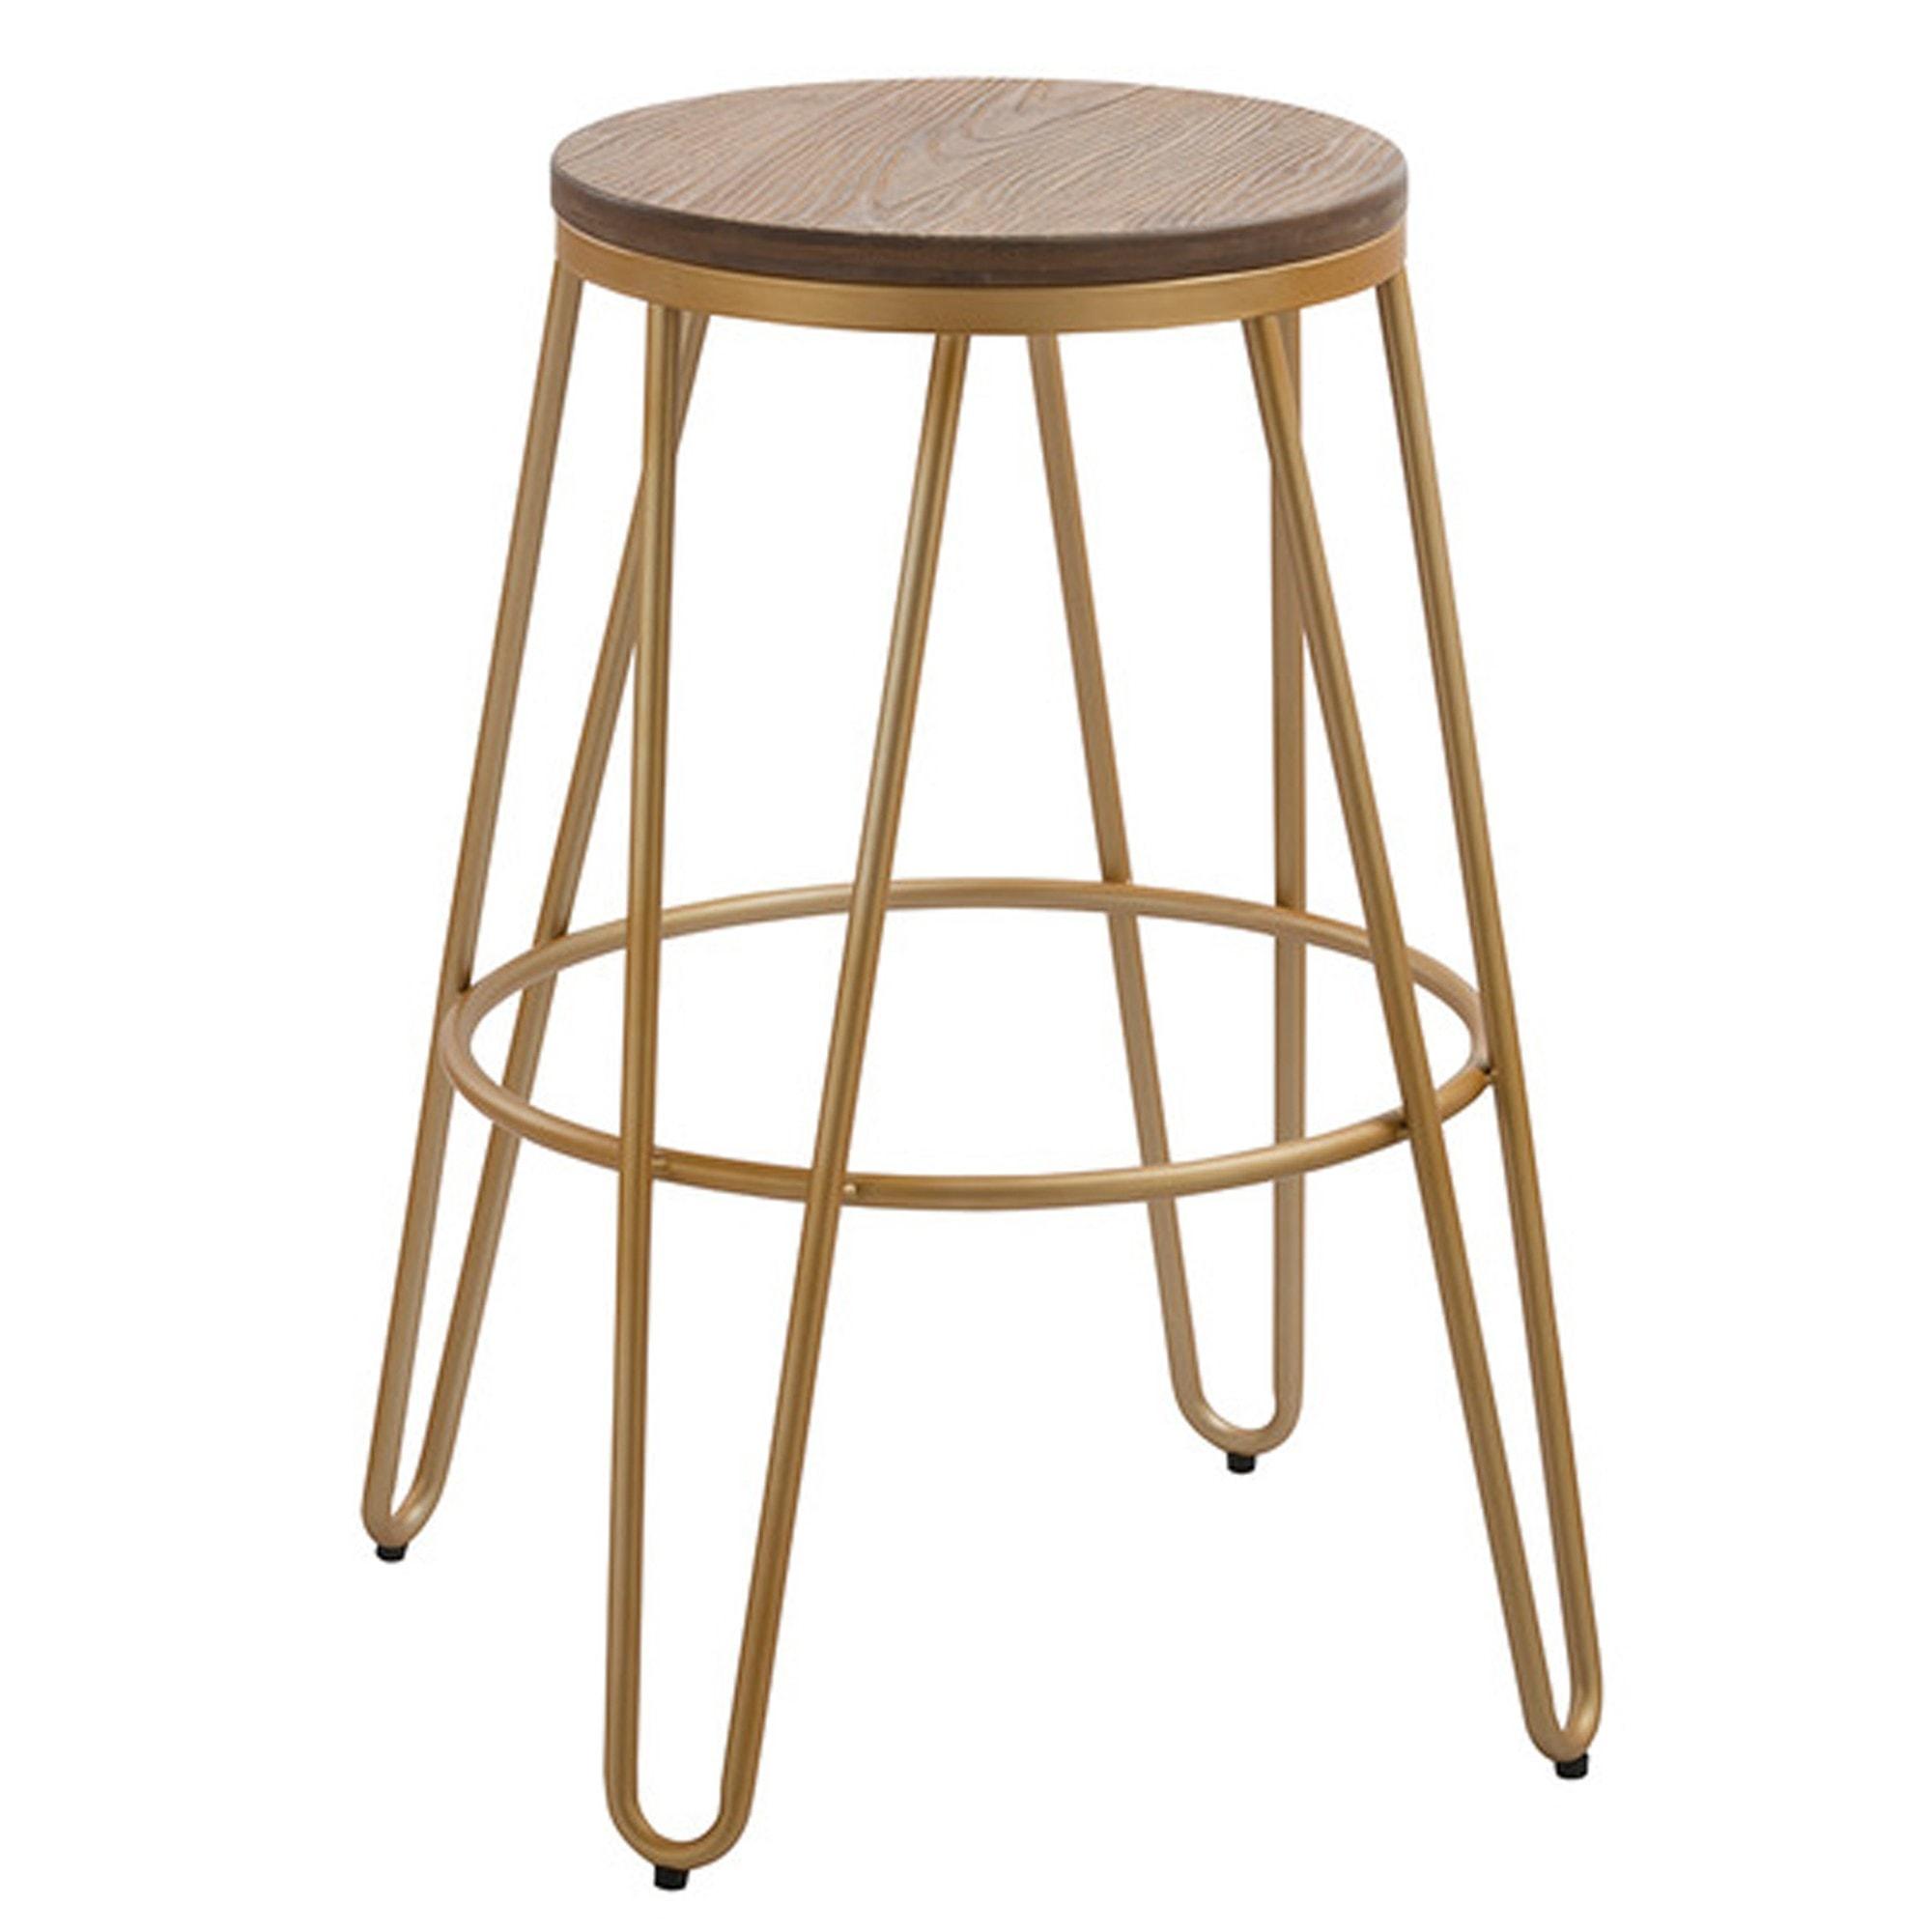 Astonishing Gold Metal Bar Stool Machost Co Dining Chair Design Ideas Machostcouk